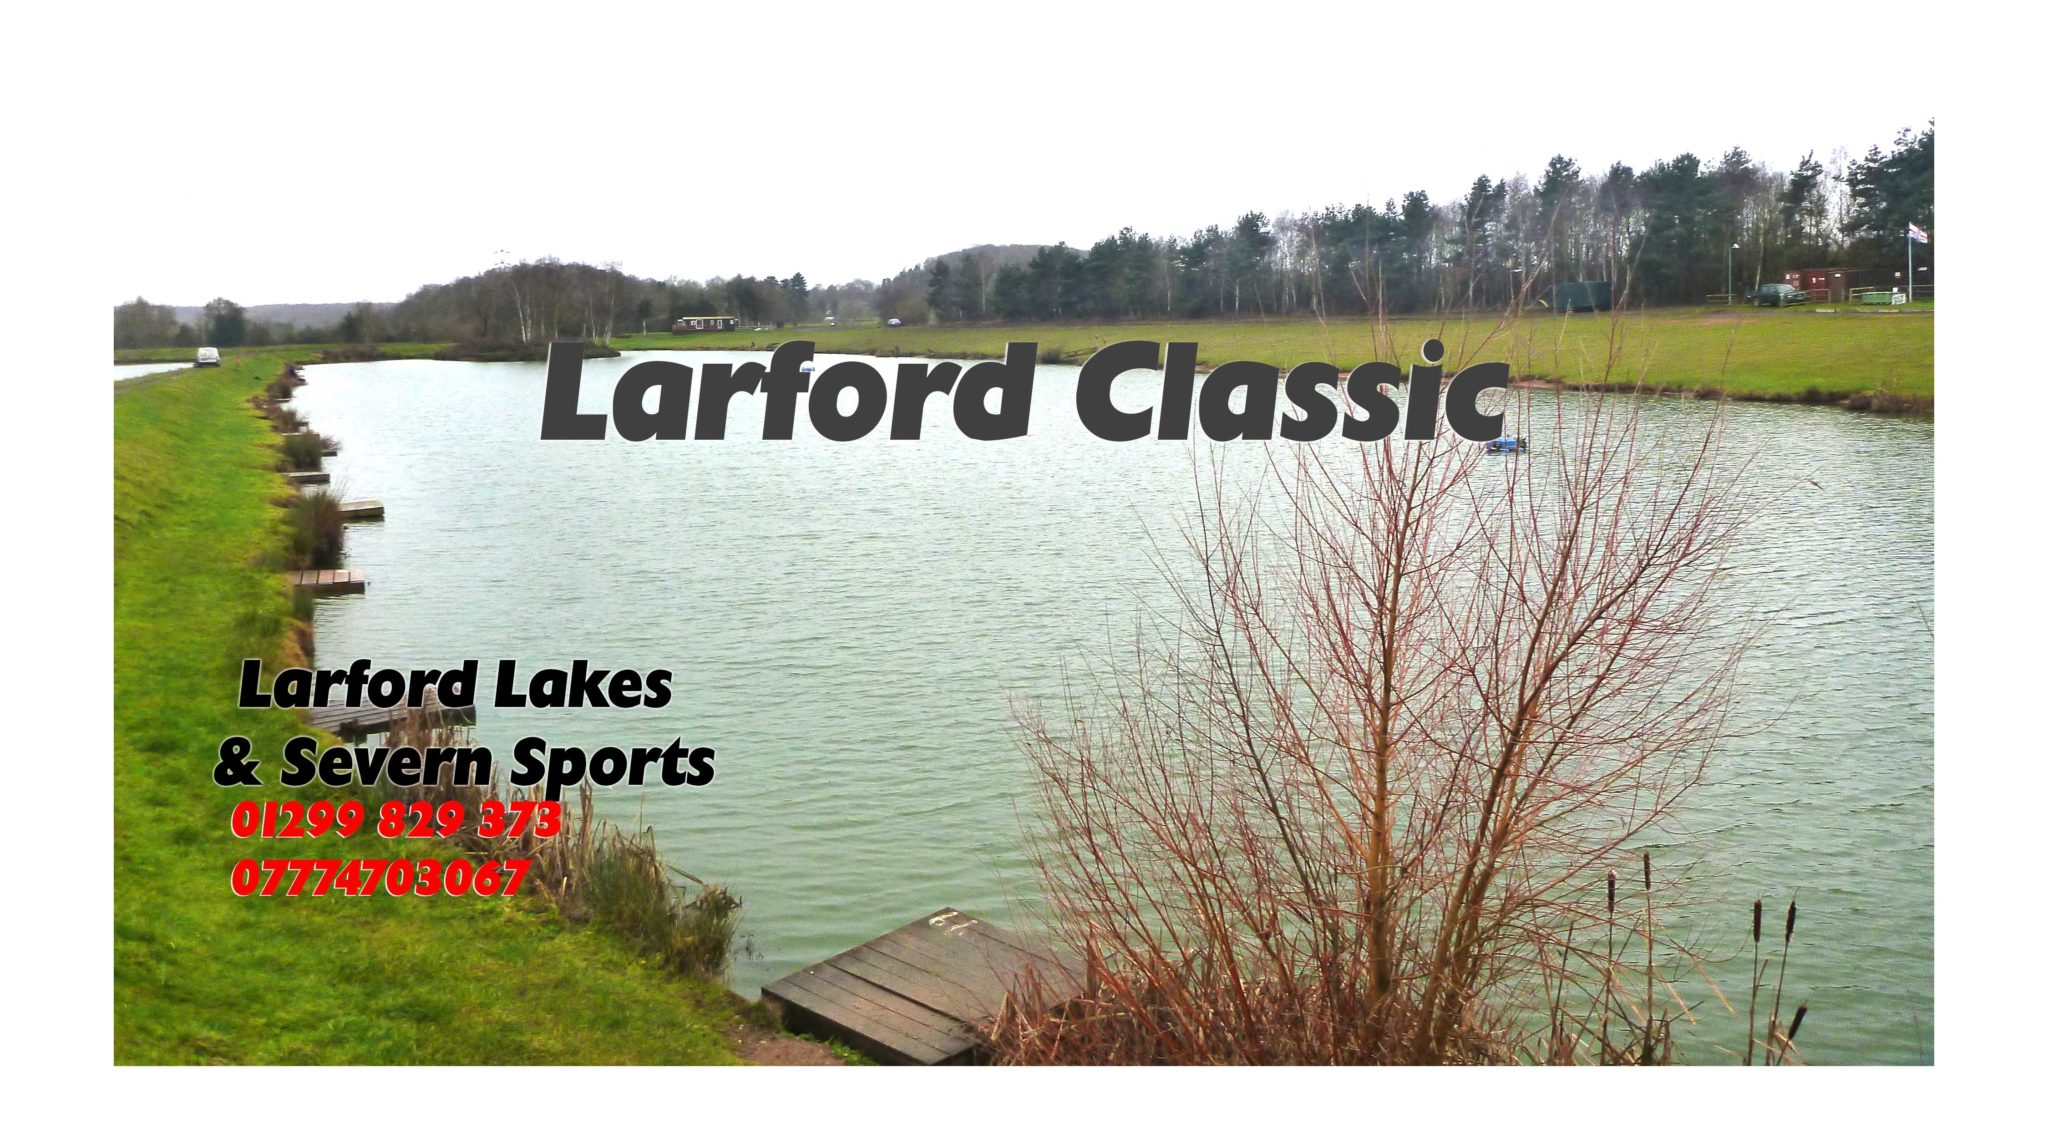 Larford Classic